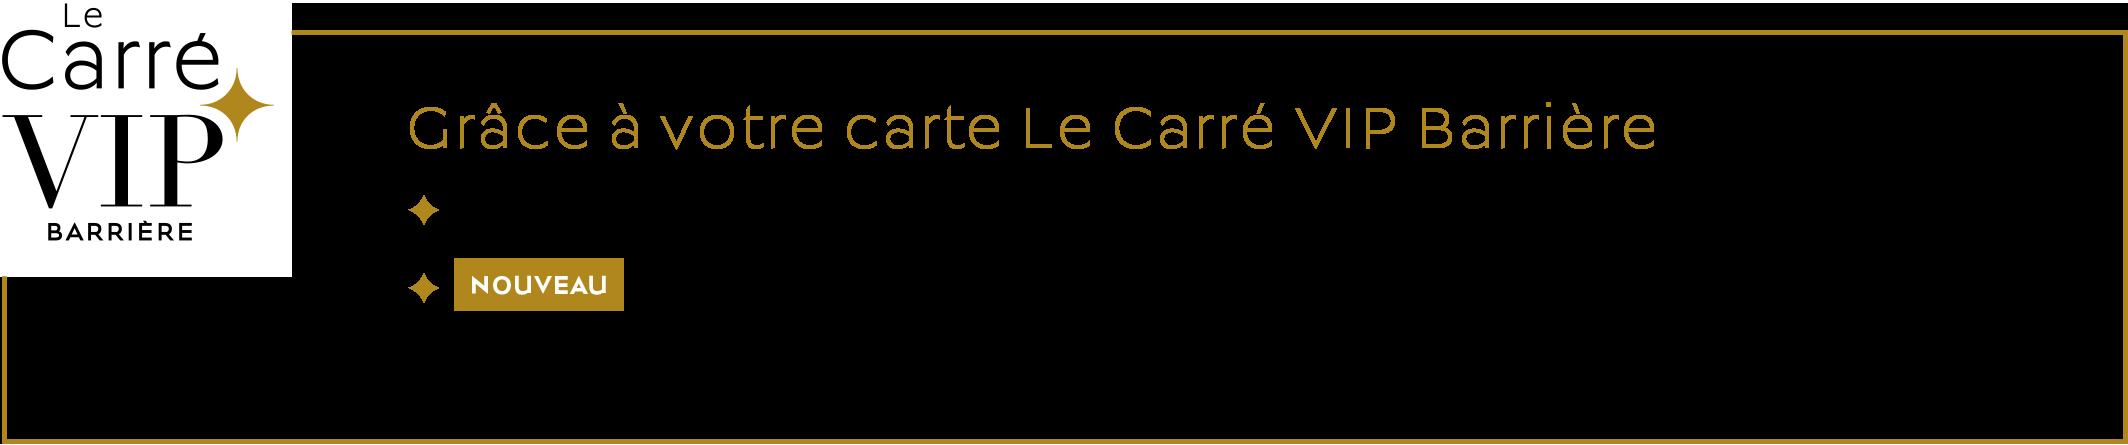 CARRE VIP